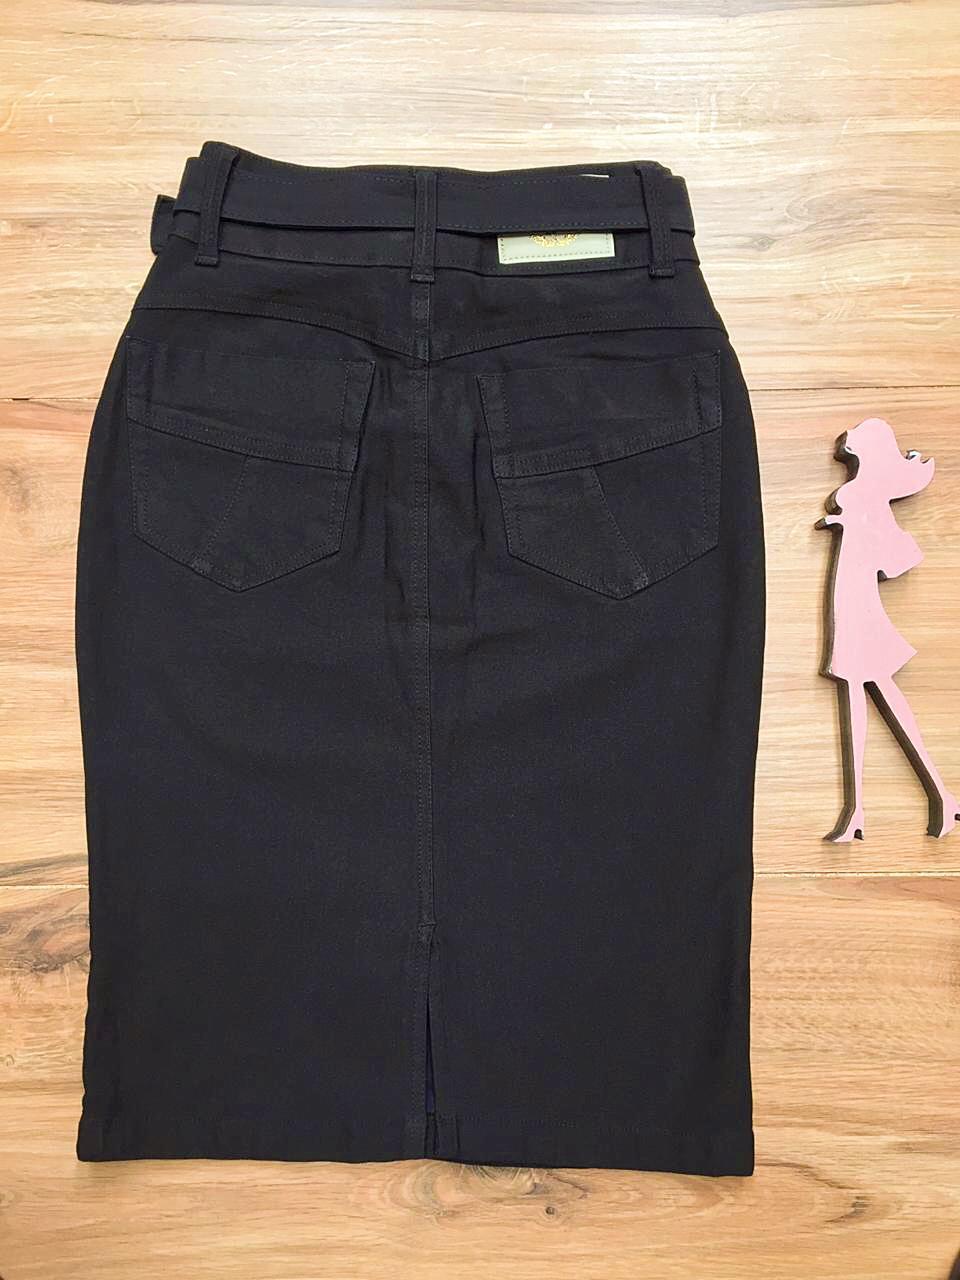 Saia Jeans Coleção Primavera Saia Bella SB041 Preta